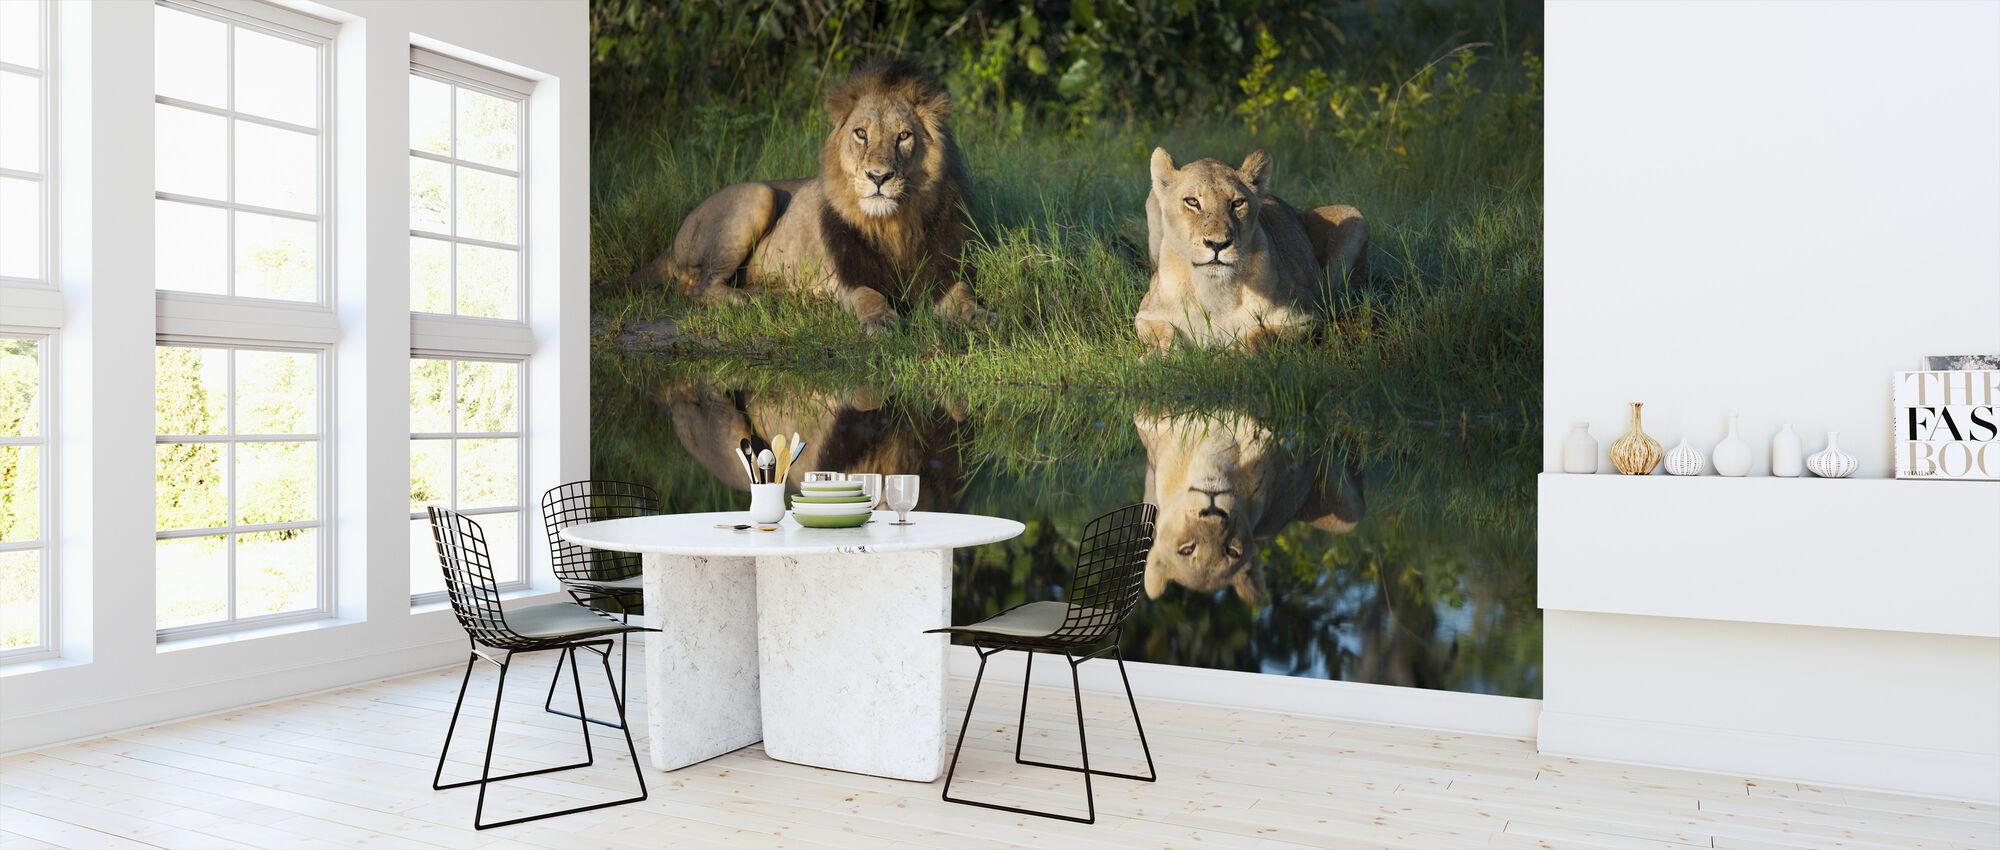 Lions Reflection - Wallpaper - Kitchen